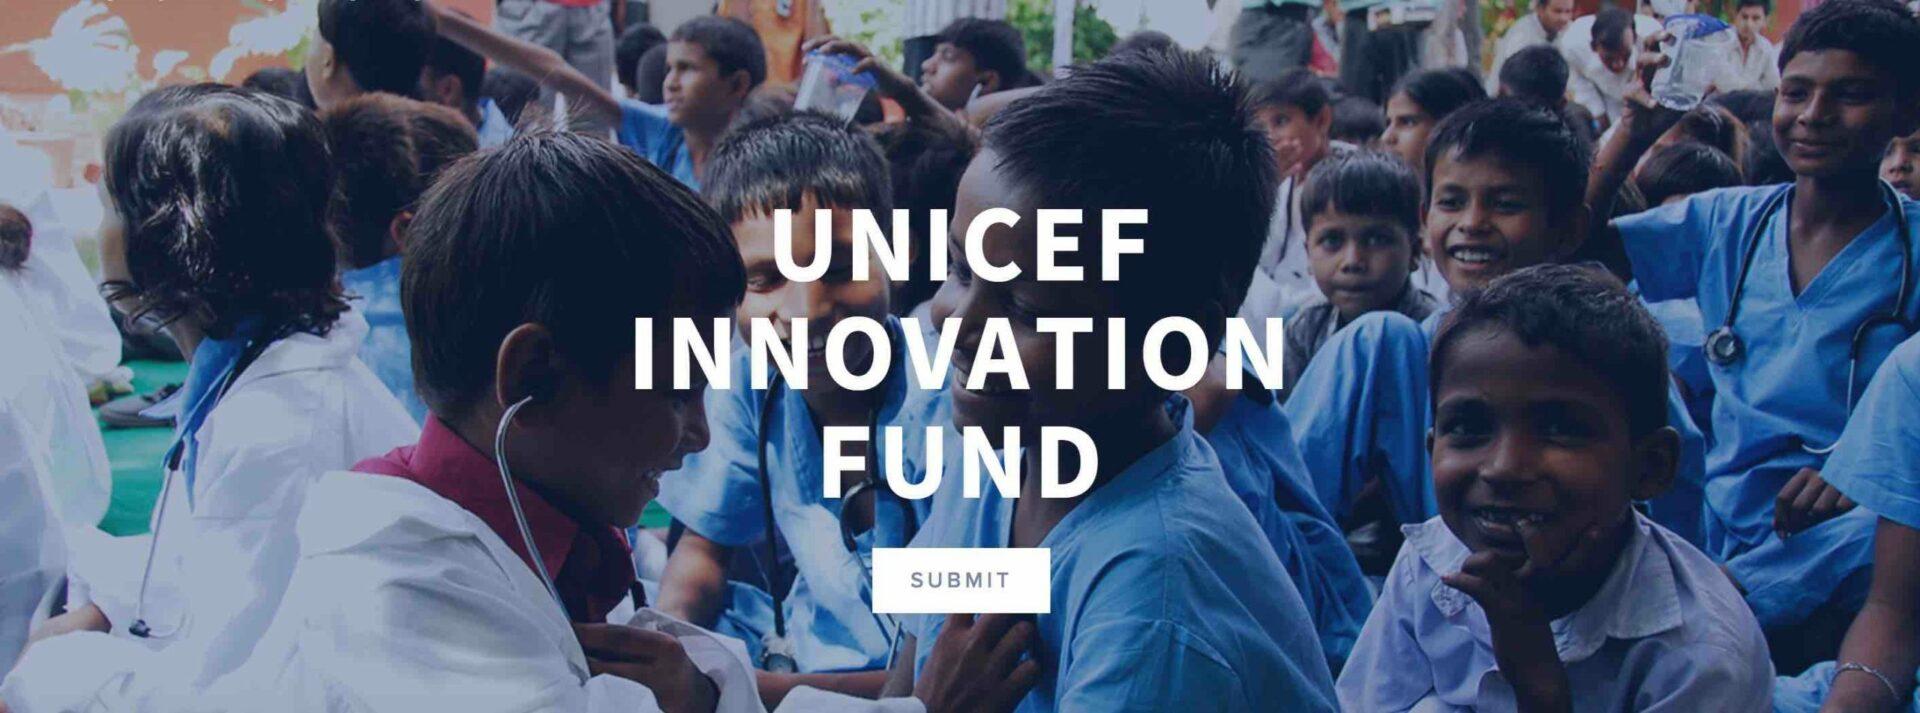 UNICEF-Fund